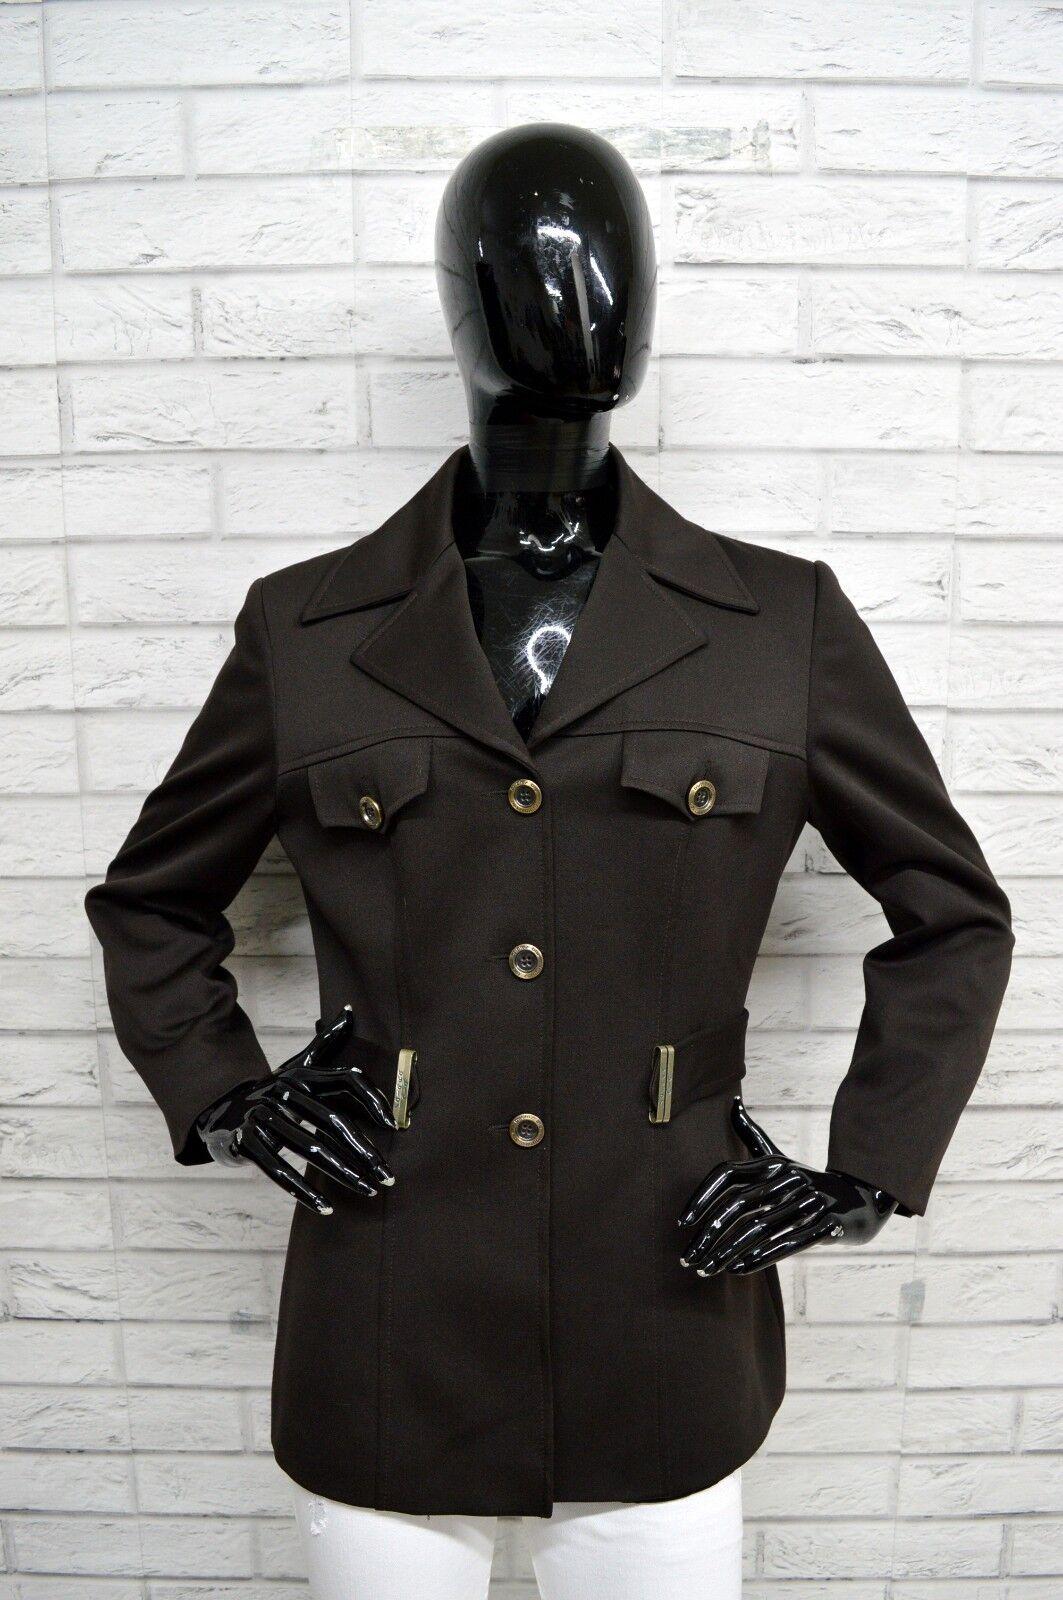 Giacca BYBLOS Donna Taglia Dimensione 44 Cappotto Giubbino Jacket Jacket Jacket Donna Coat Marronee 43456f